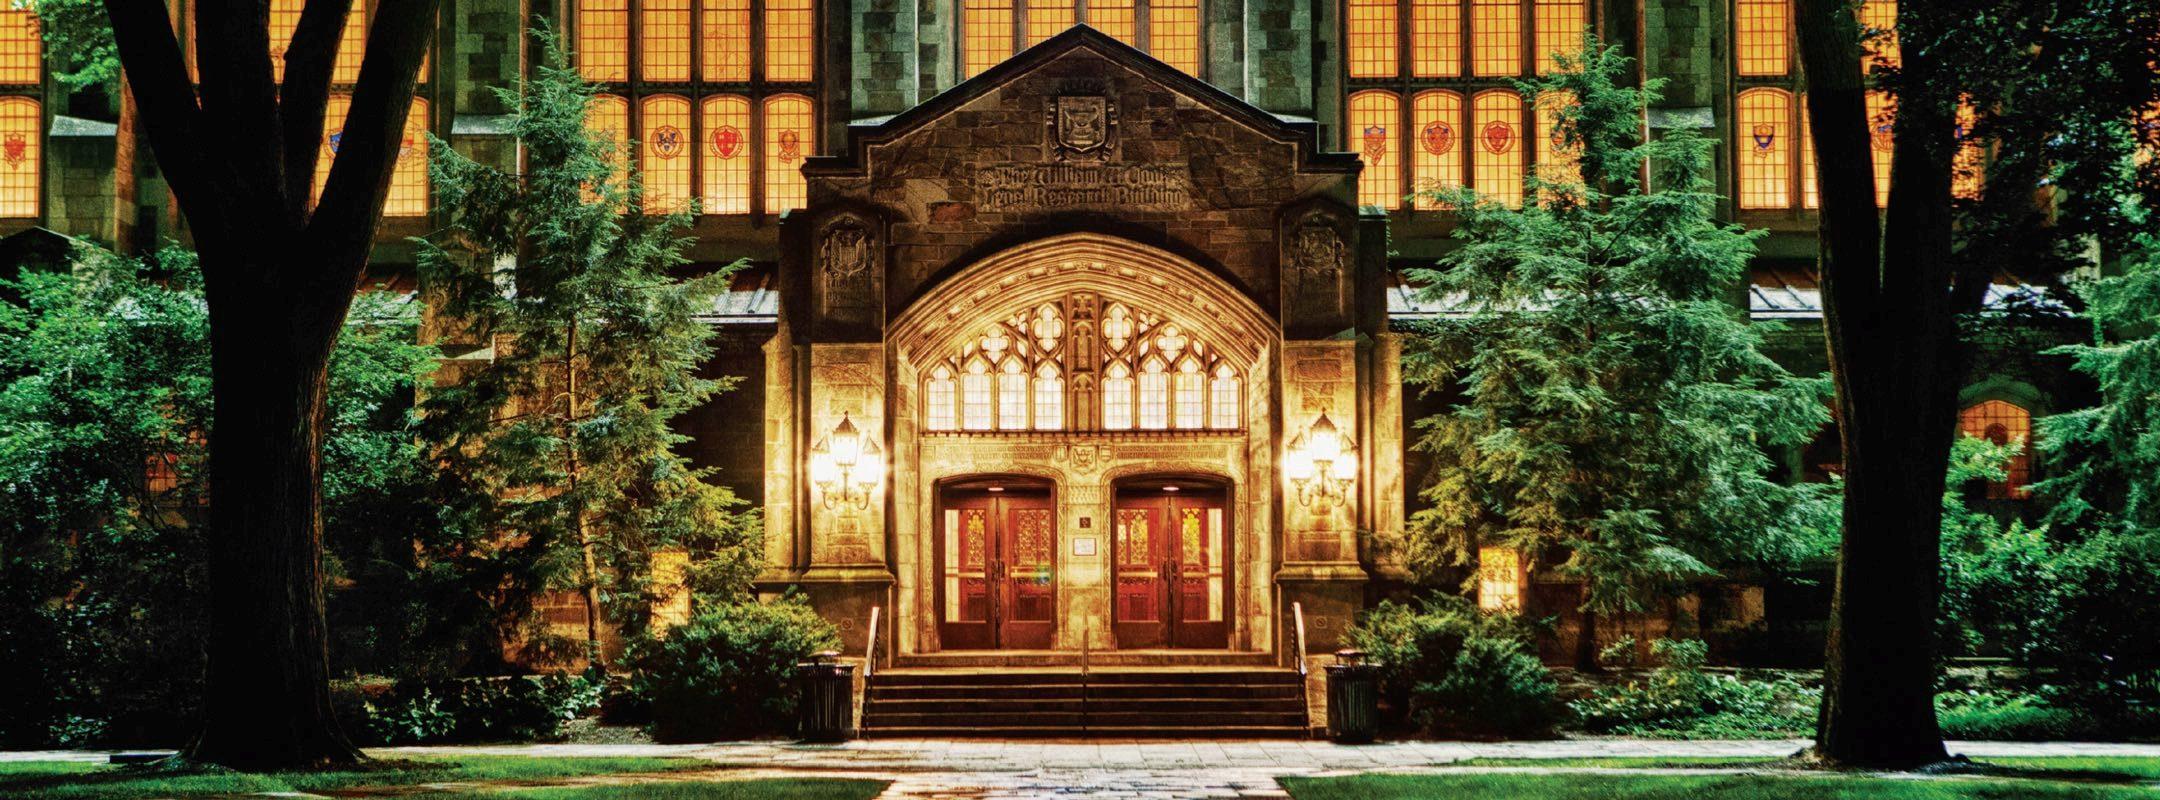 The University of Michigan Law School